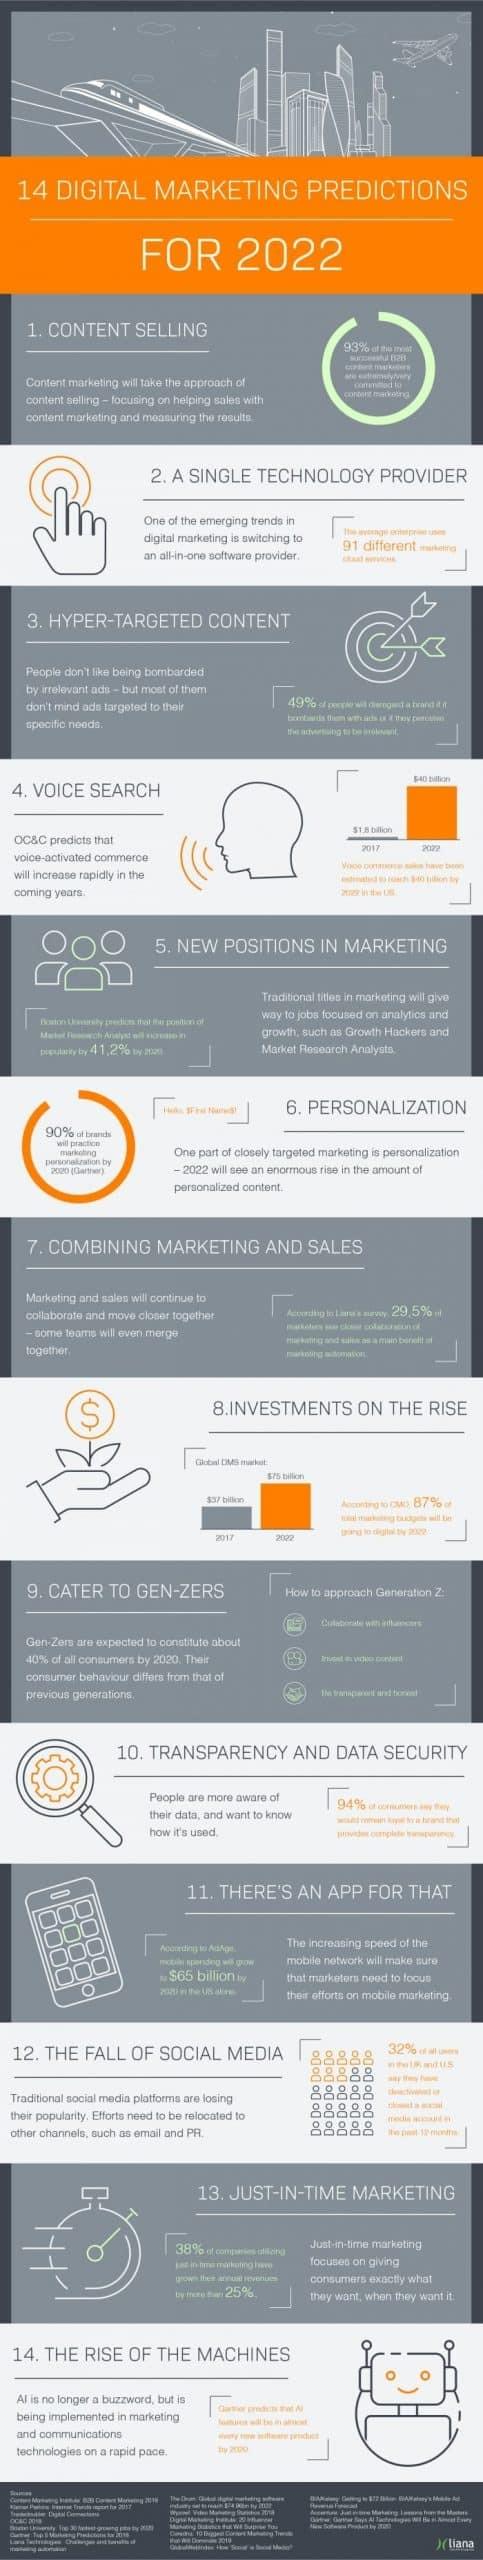 infografia predicciones marketing para 2020